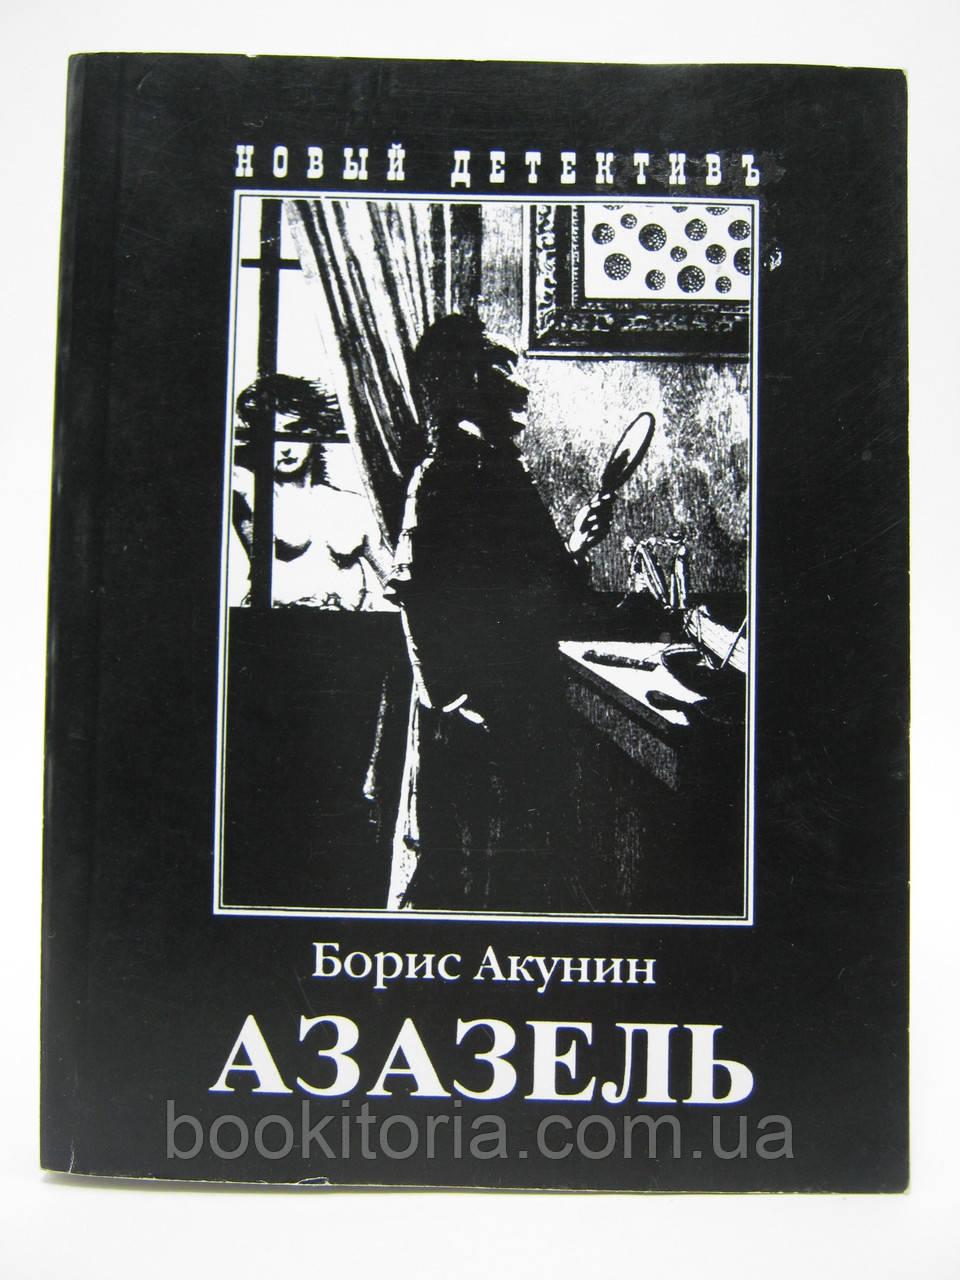 Акунин Б. Азазель.